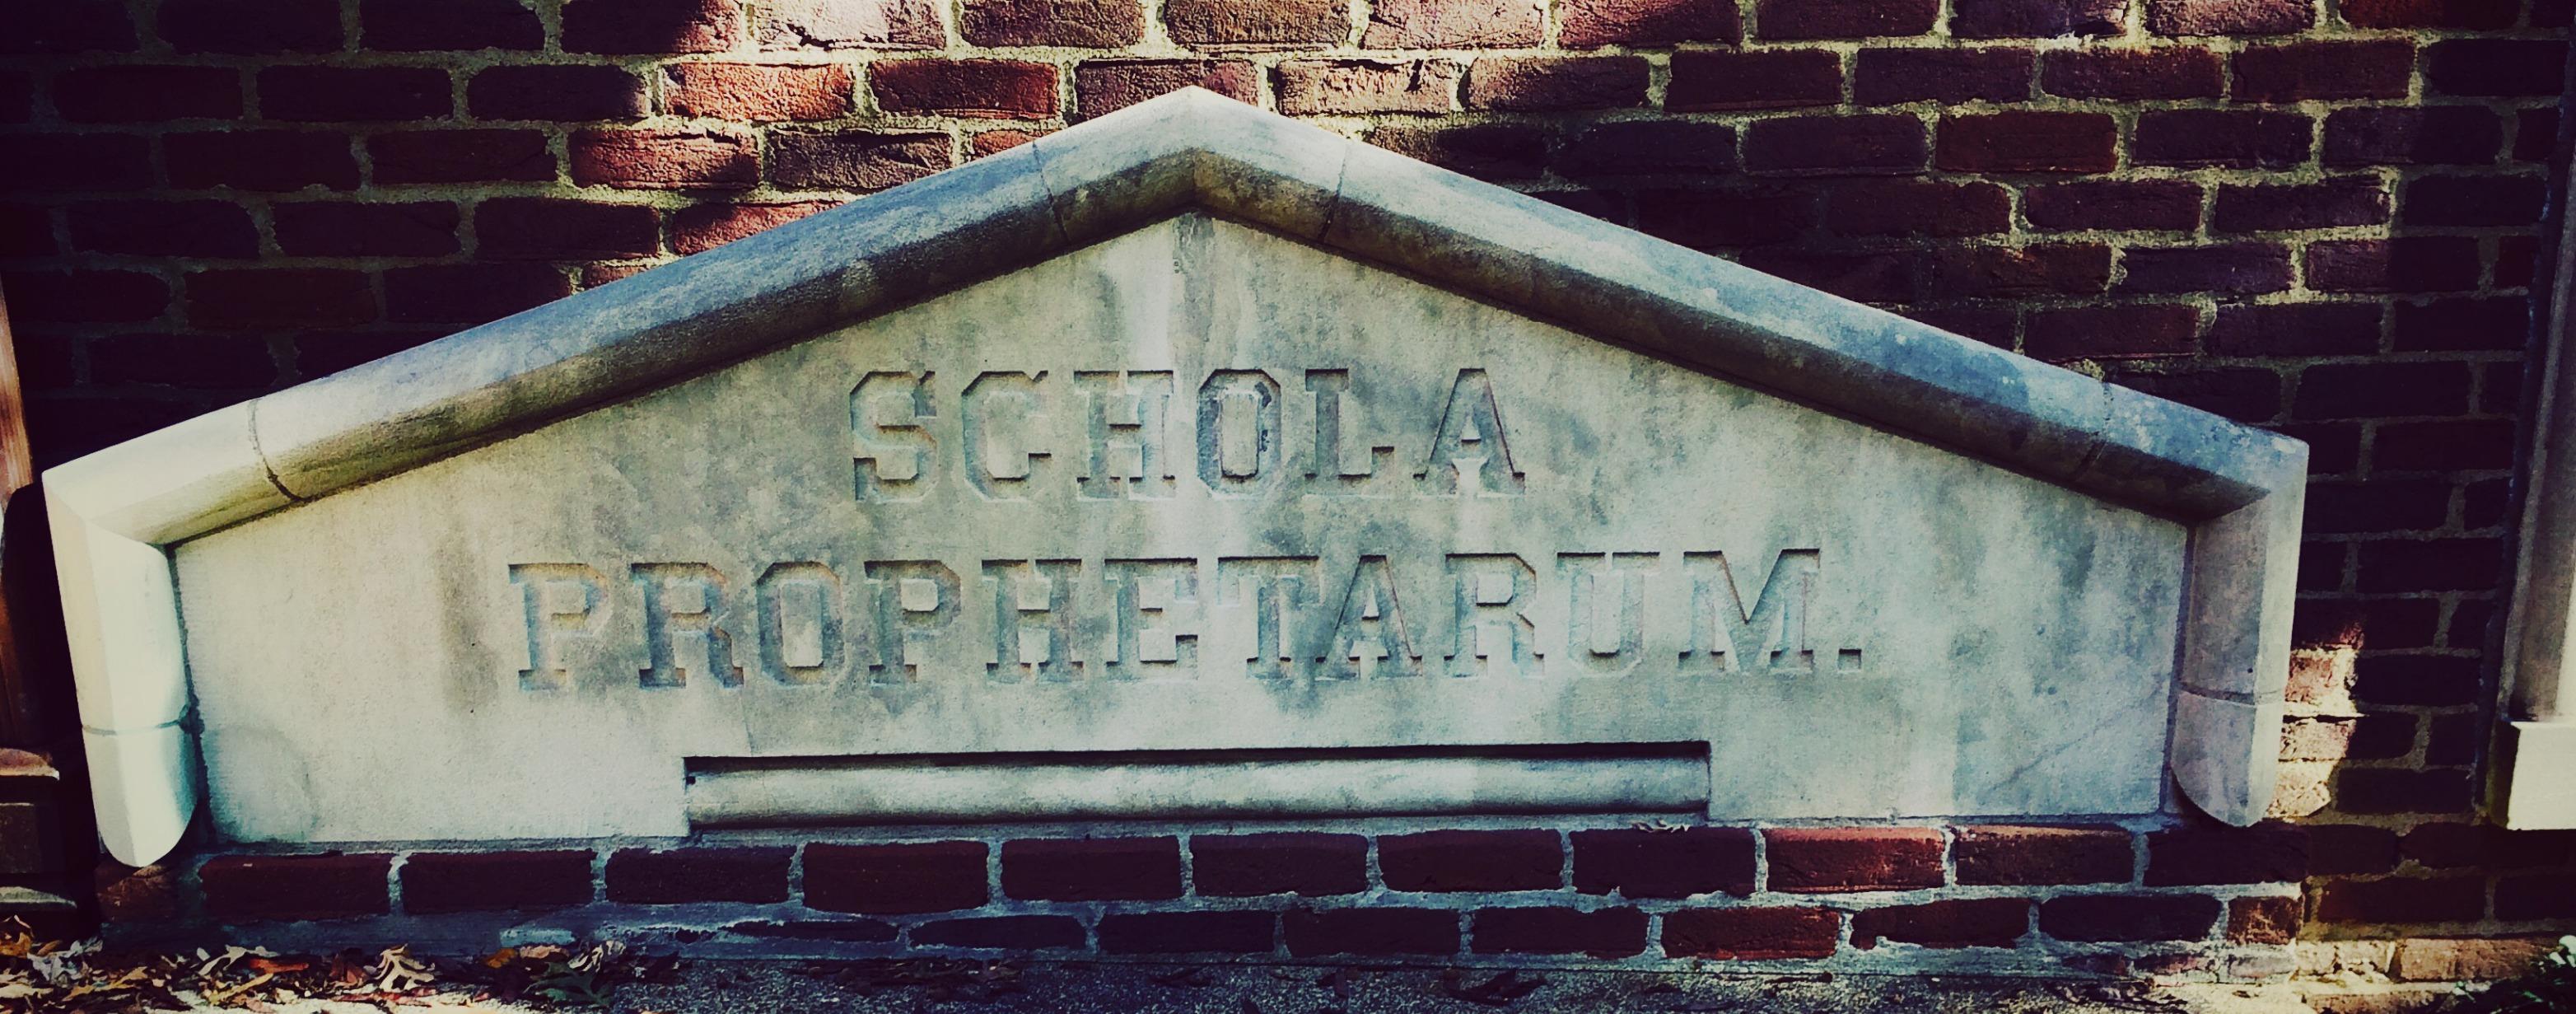 schola prophetarum